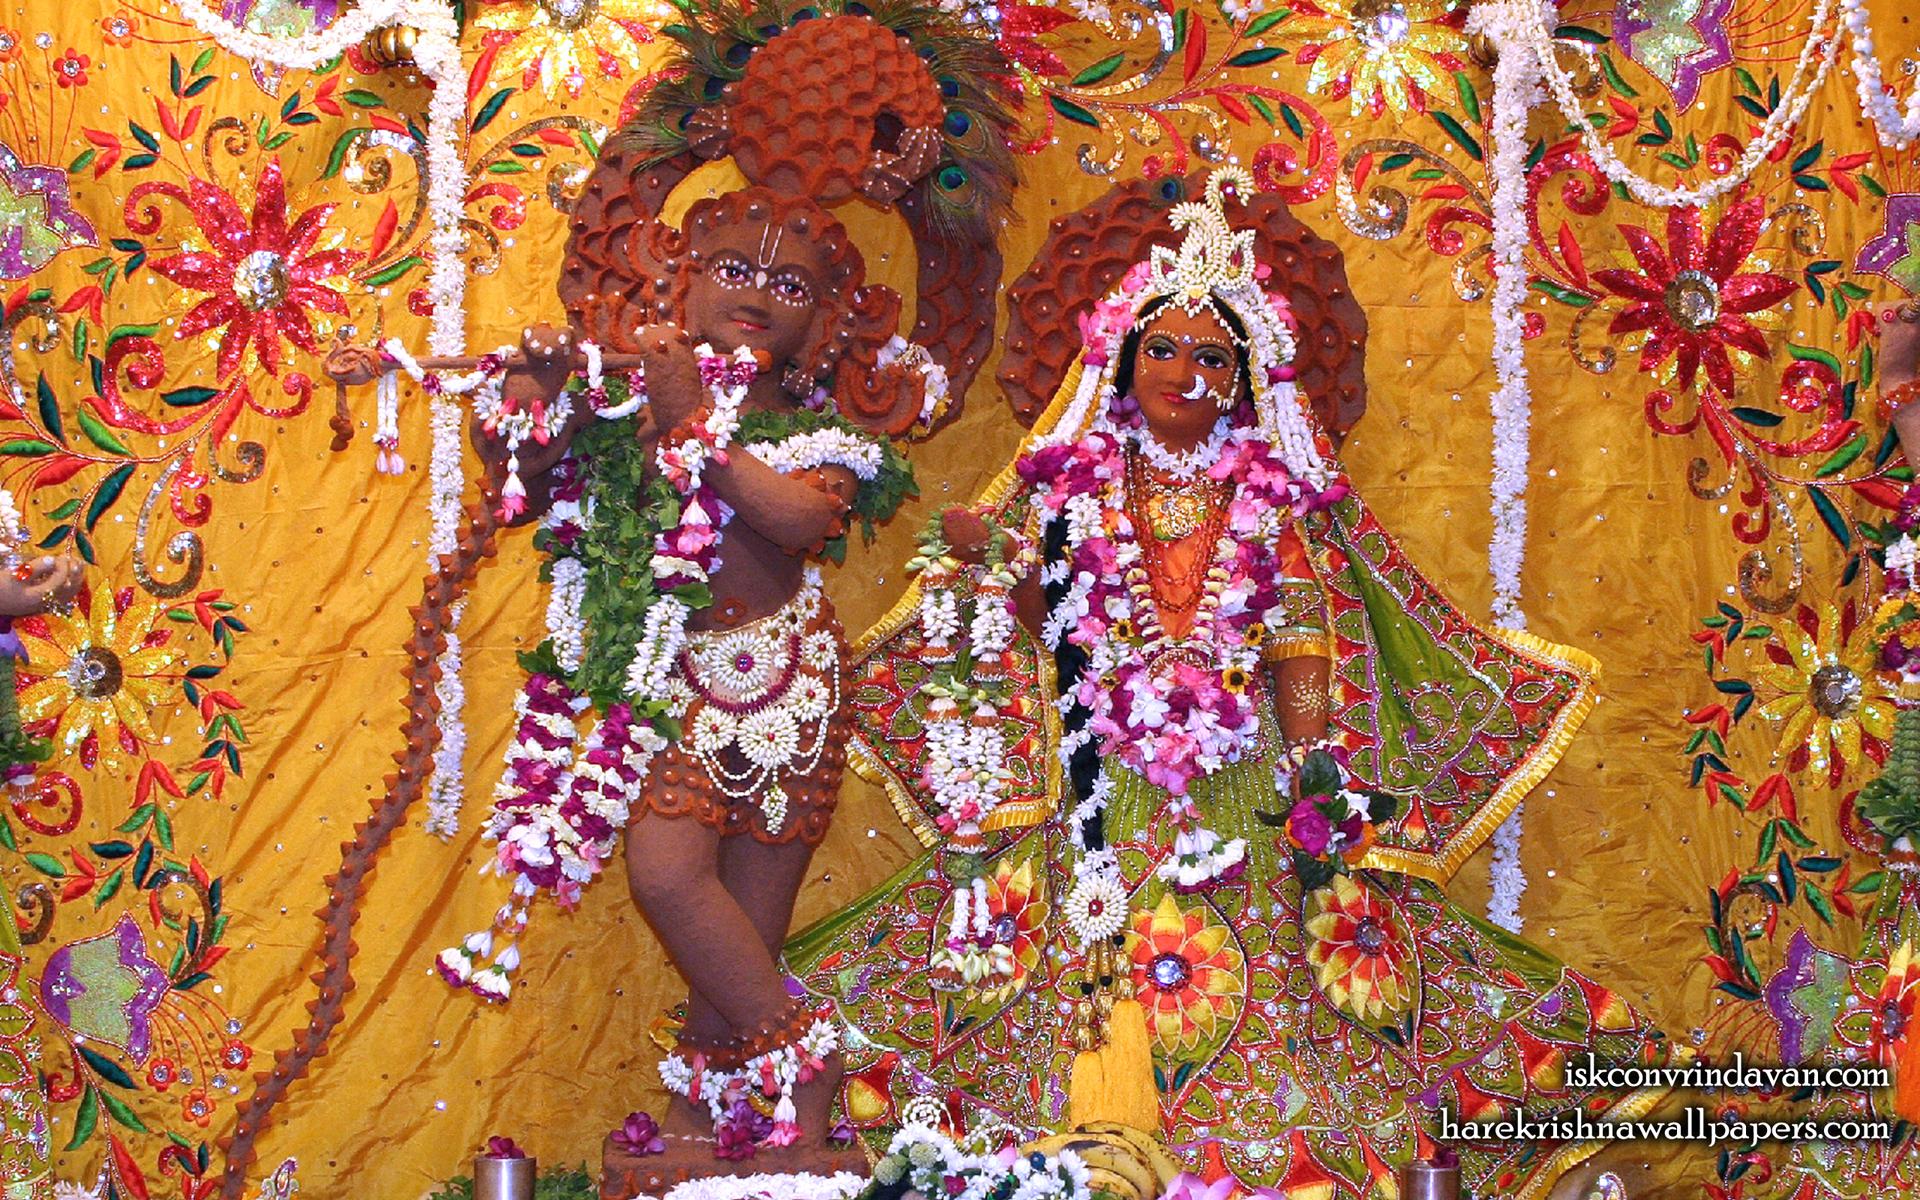 Sri Sri Radha Shyamsundar Wallpaper (011) Size 1920x1200 Download